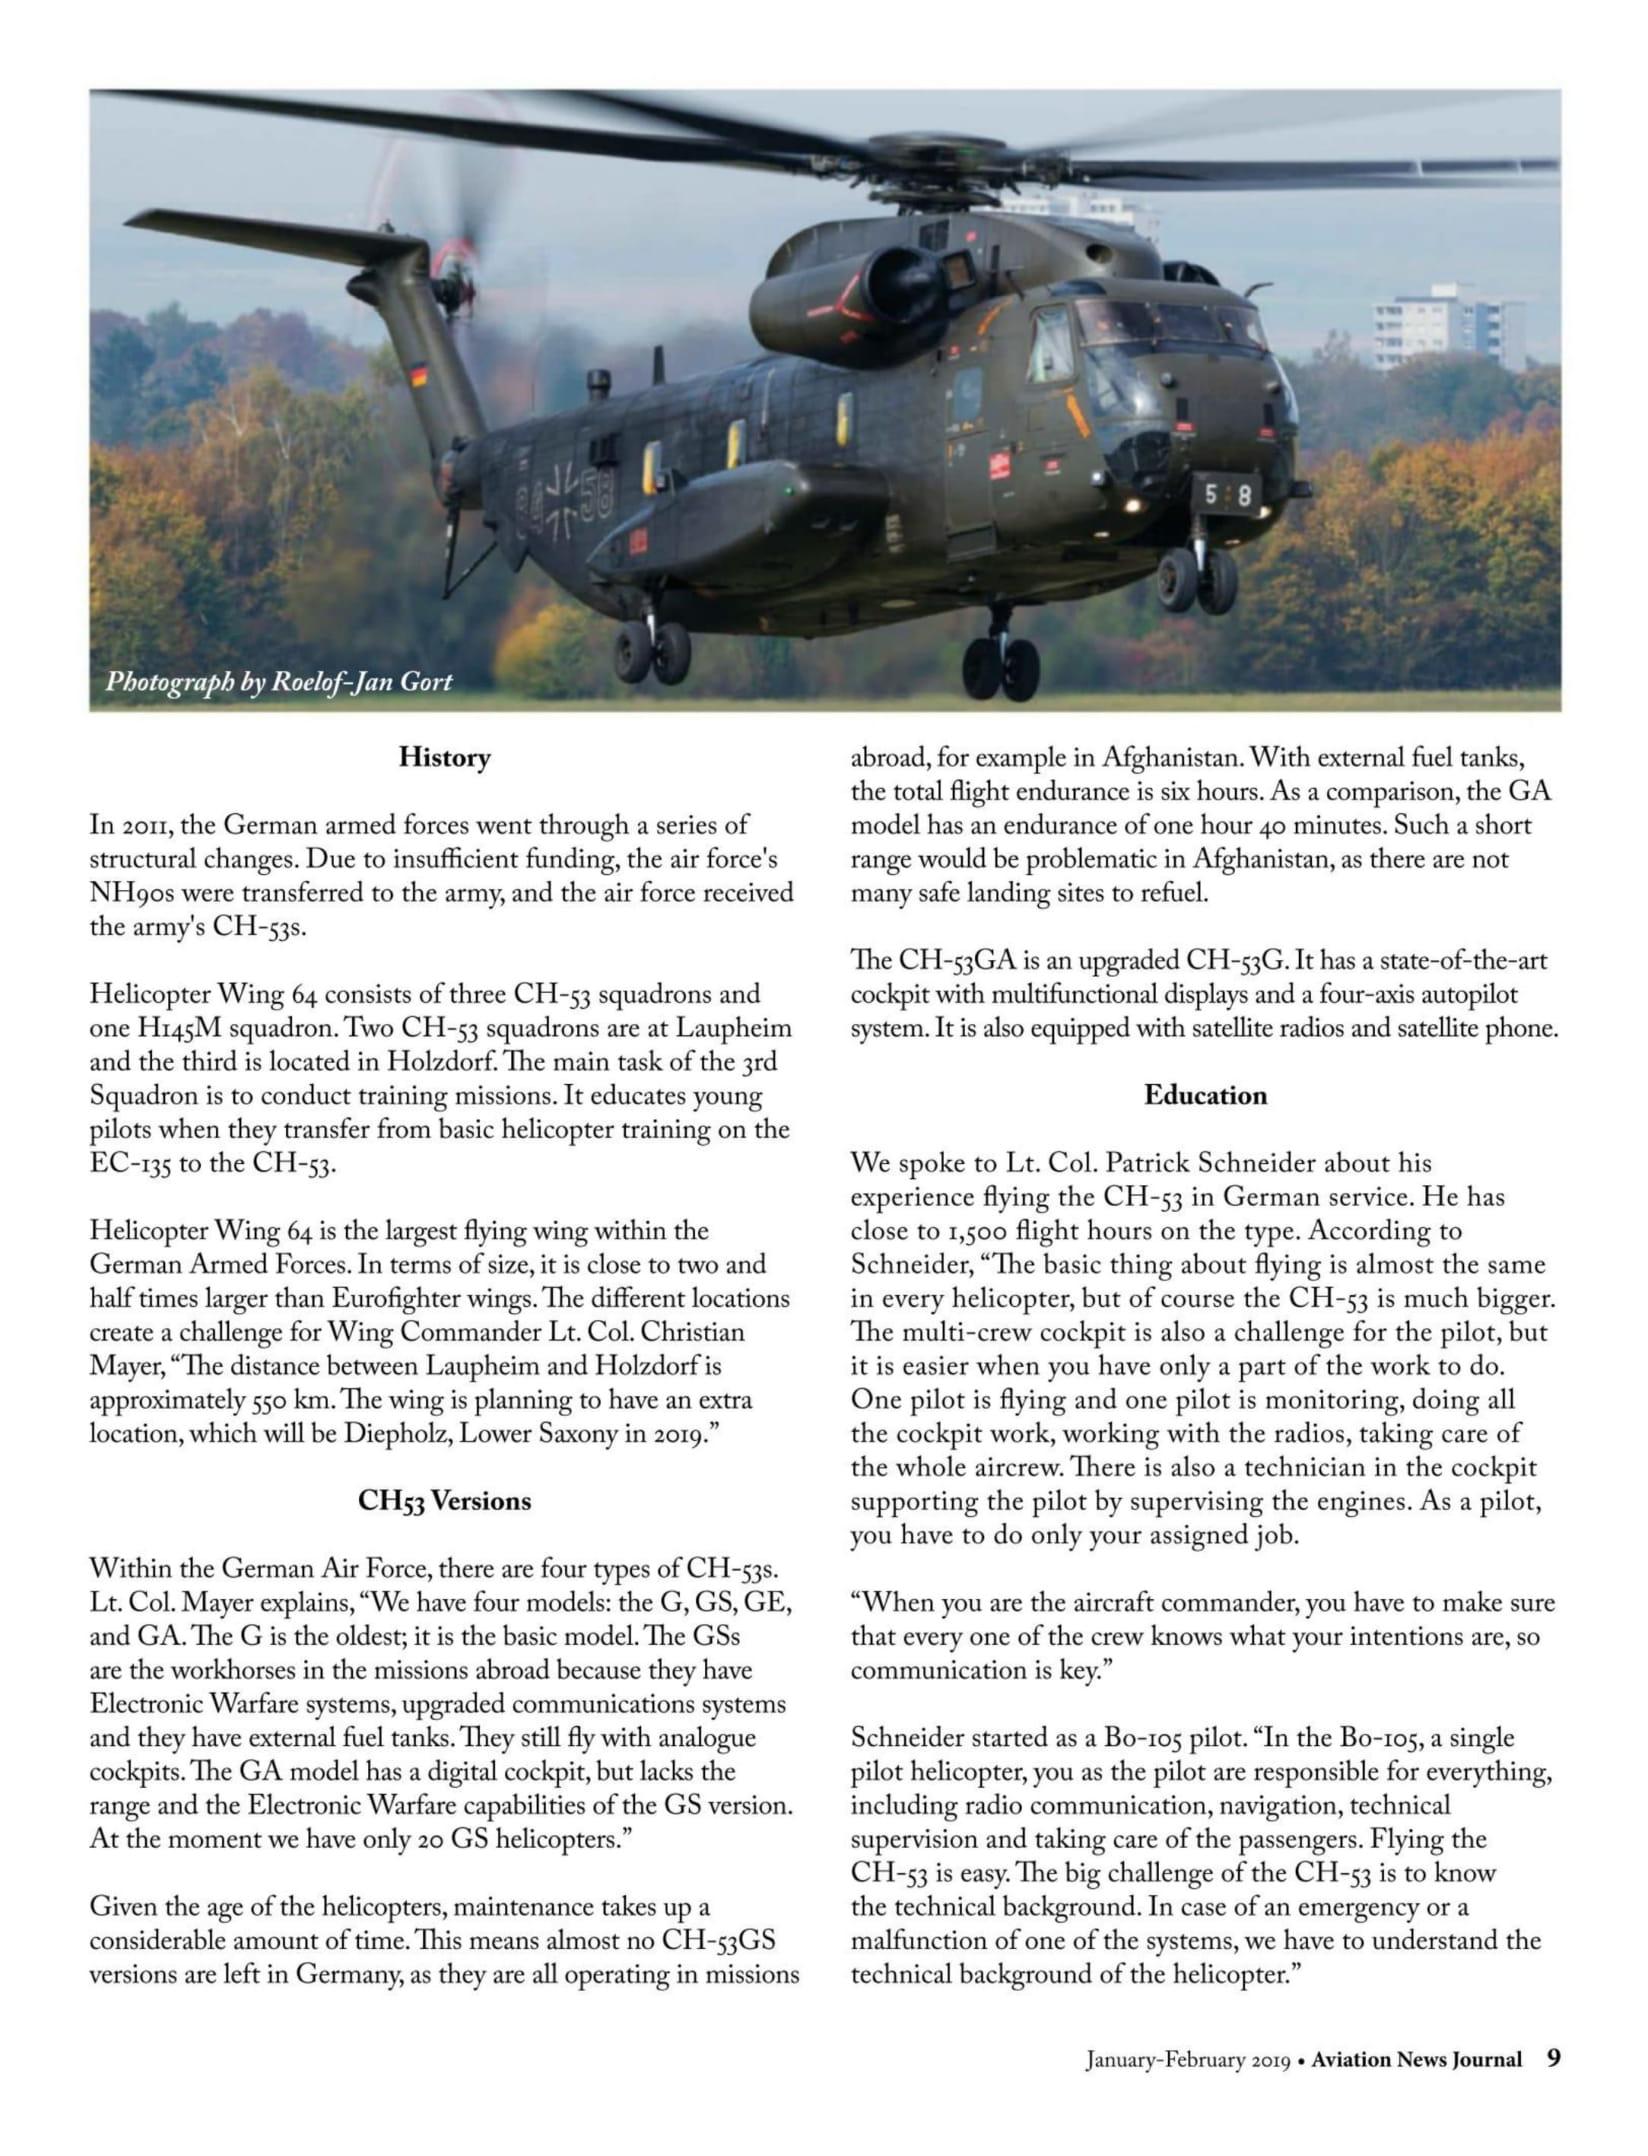 Aviation News Journal (Canada)_CH53s of the HSG 64, Laupheim AB-3